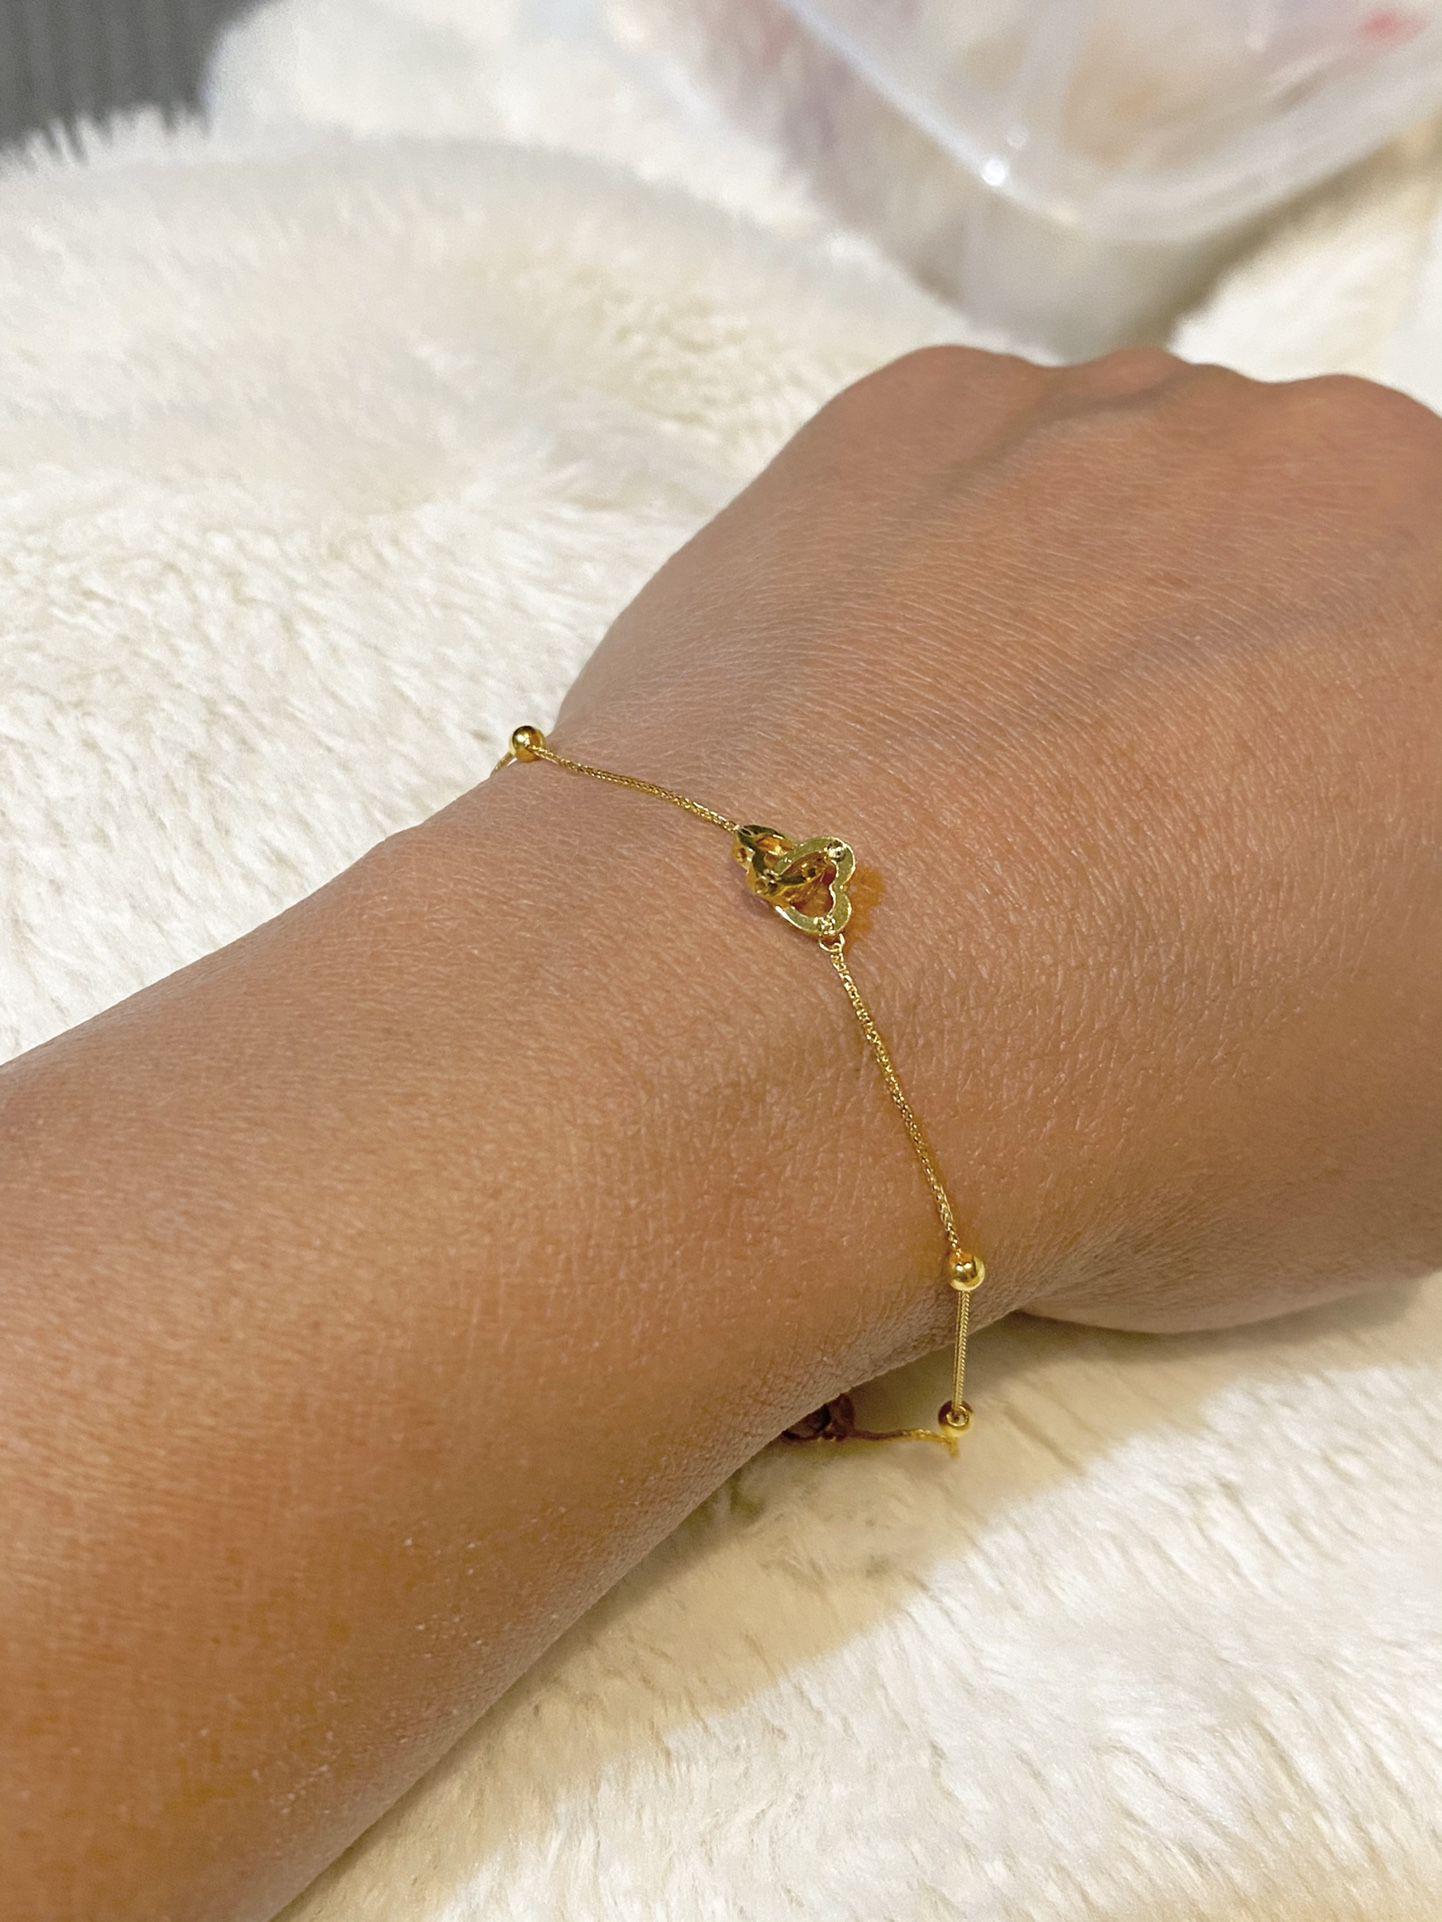 Real 18k Saudi gold double heart bracelet